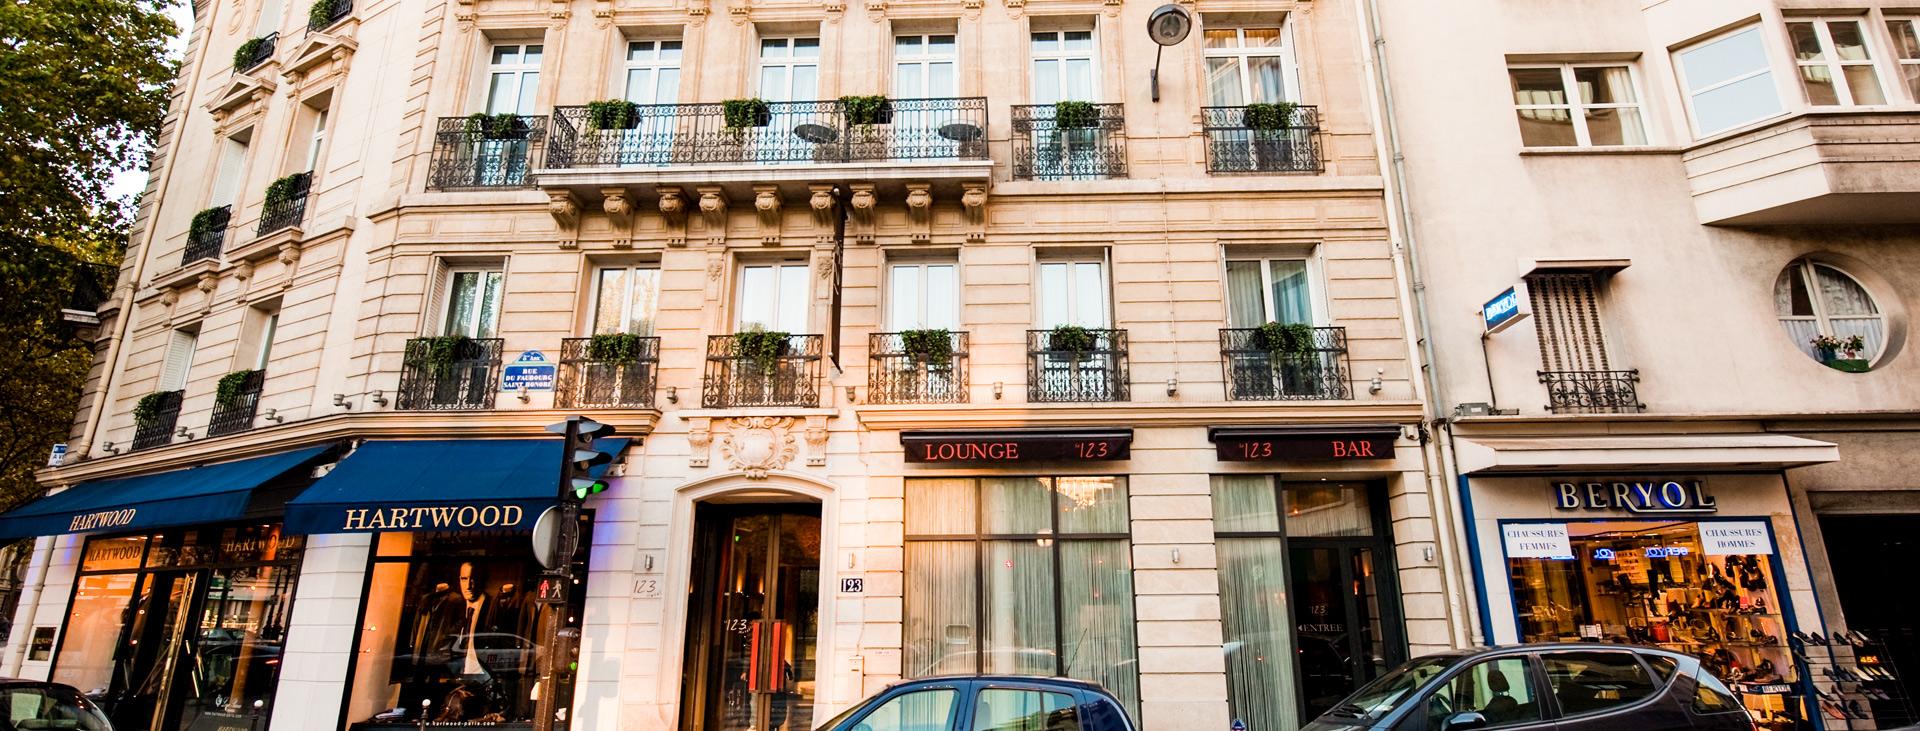 Hotel Le 123 Elysees, Paris, Paris, Frankrike